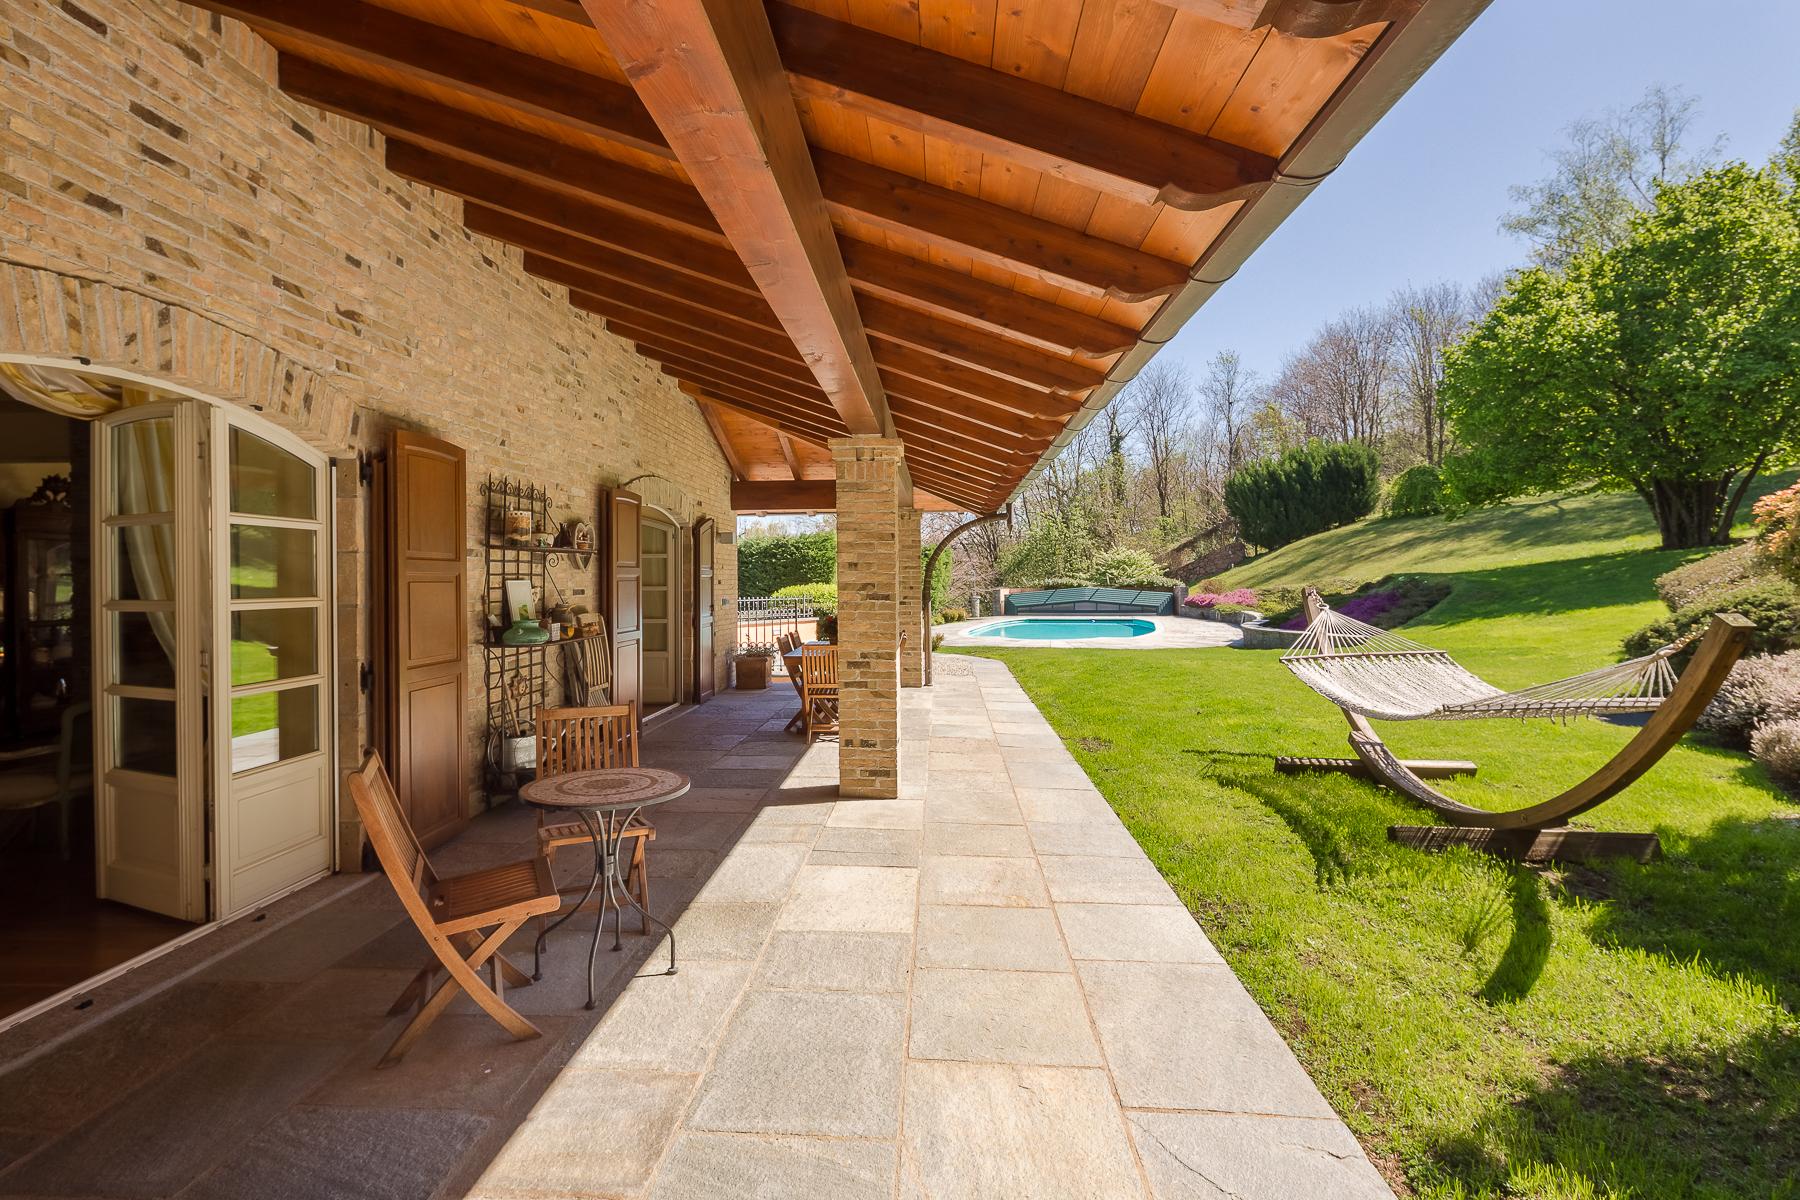 Villa in Vendita a Varese: 5 locali, 470 mq - Foto 2